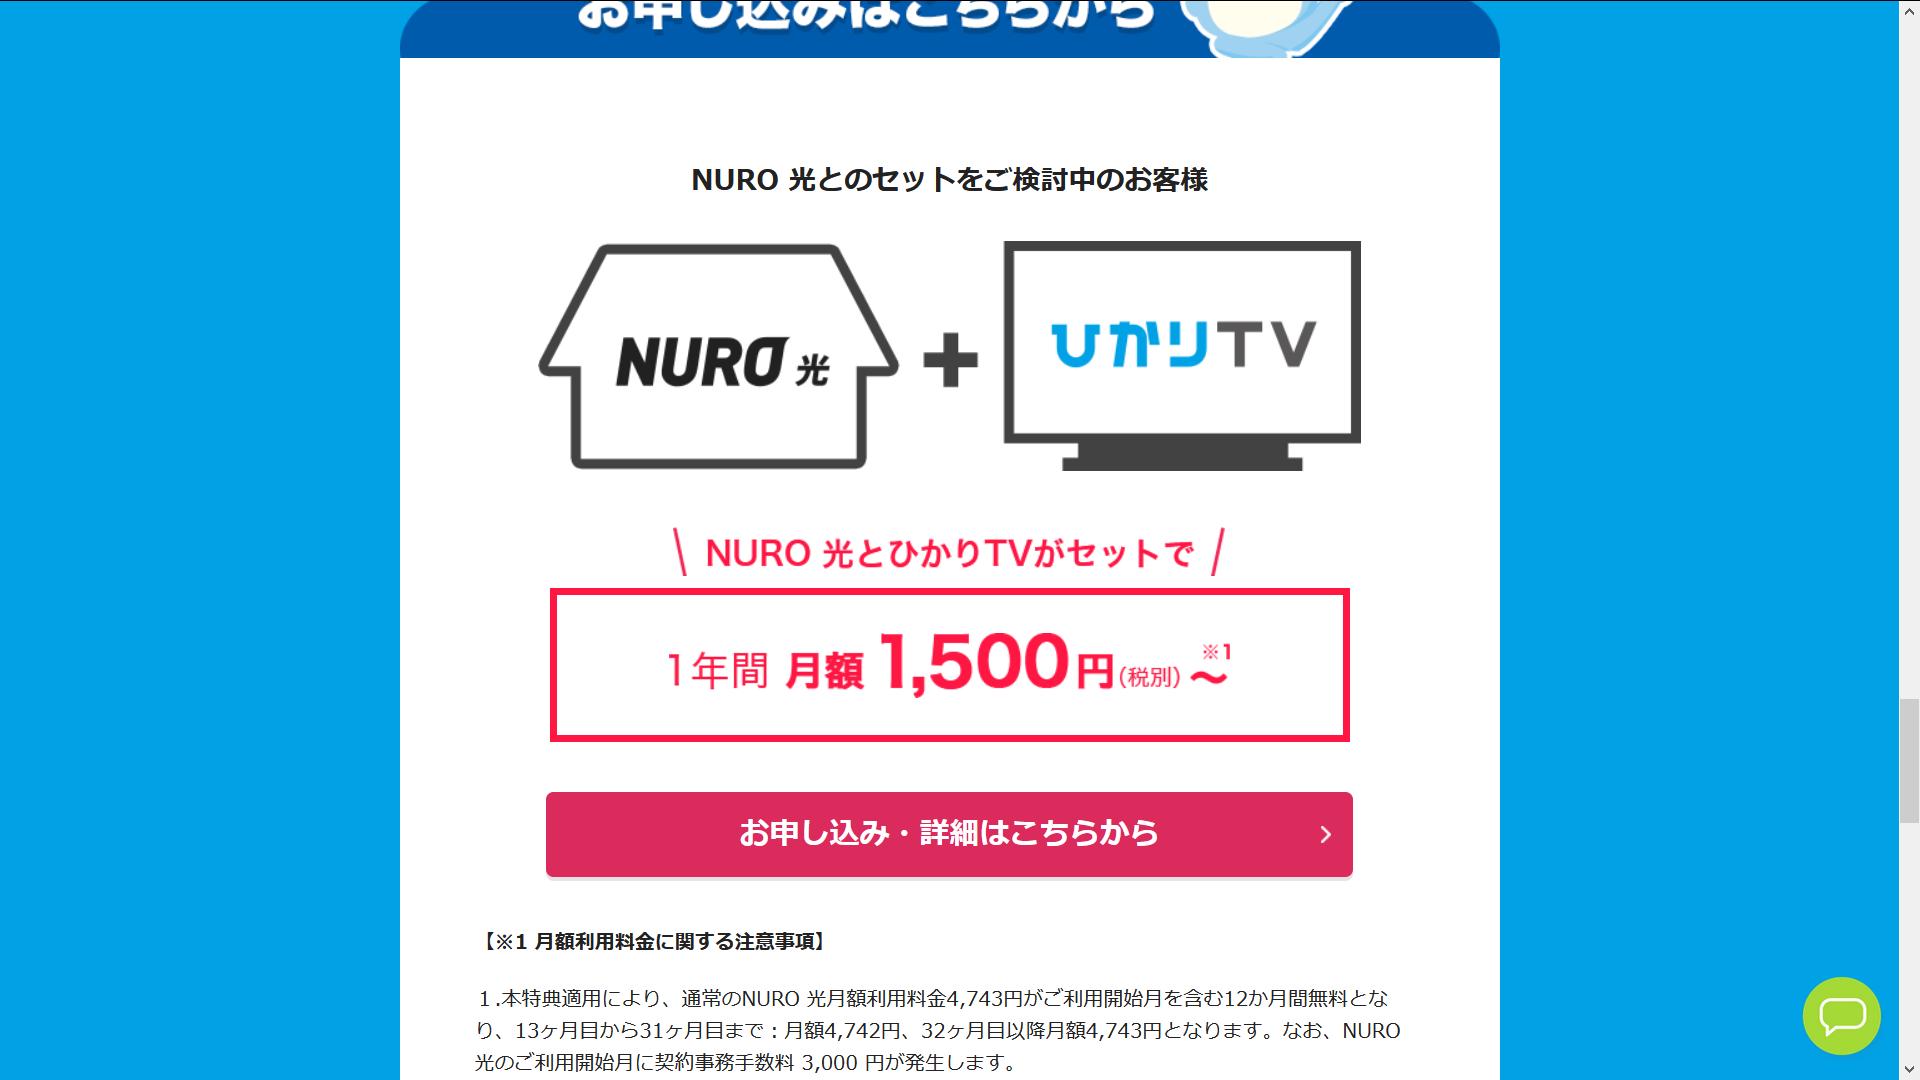 NURO_光_テレビ_申込み